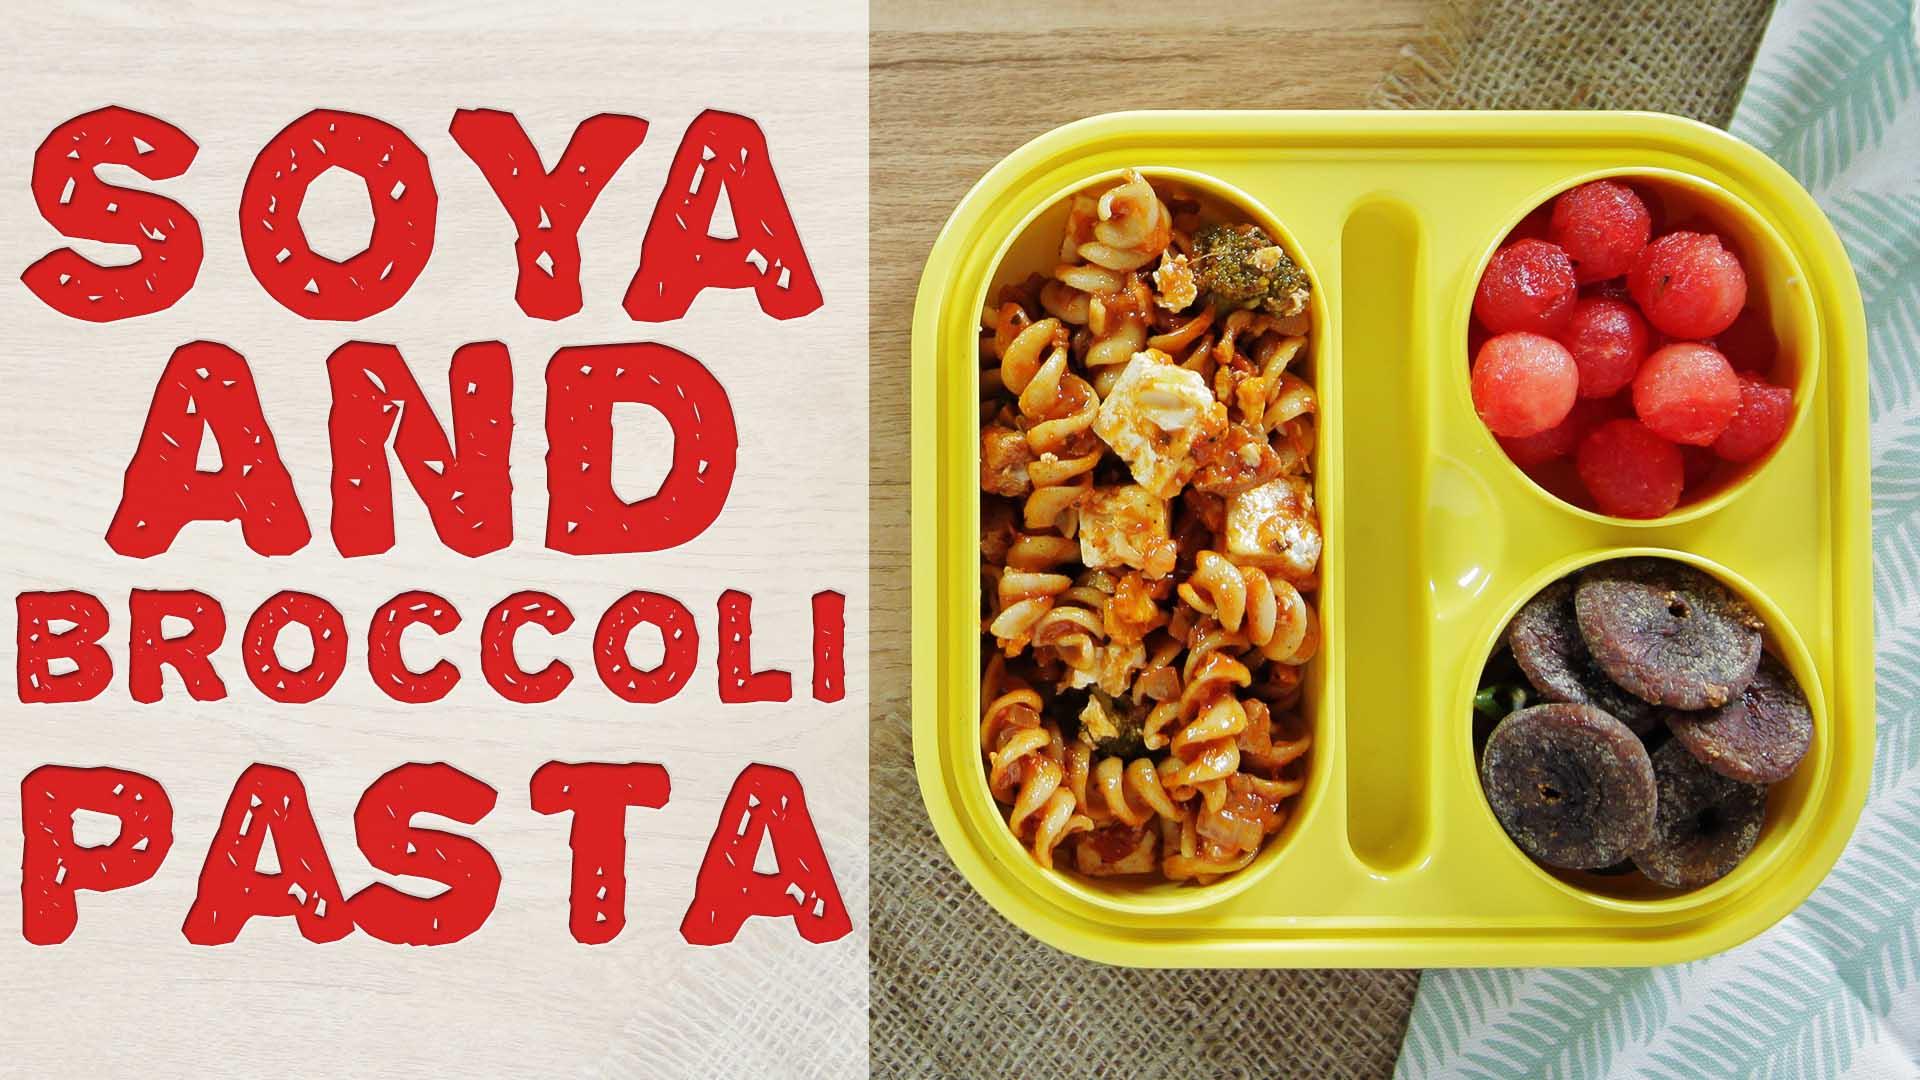 Soya and Broccoli Pasta